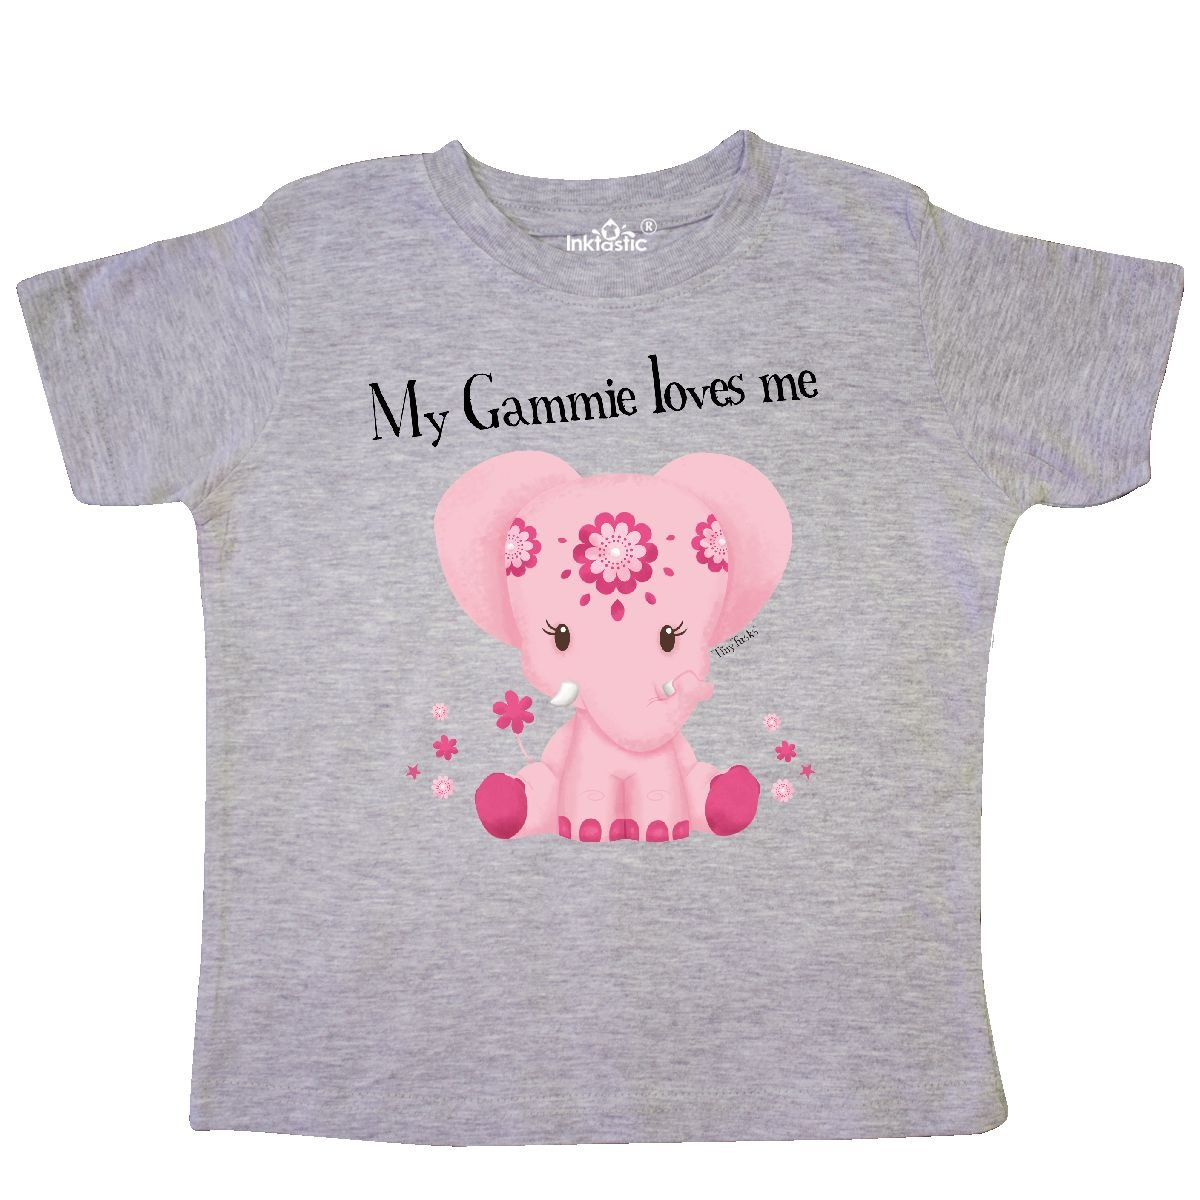 Tiny Tusks inktastic Aditi My Gammie Loves Me Pink Elephant Toddler T-Shirt